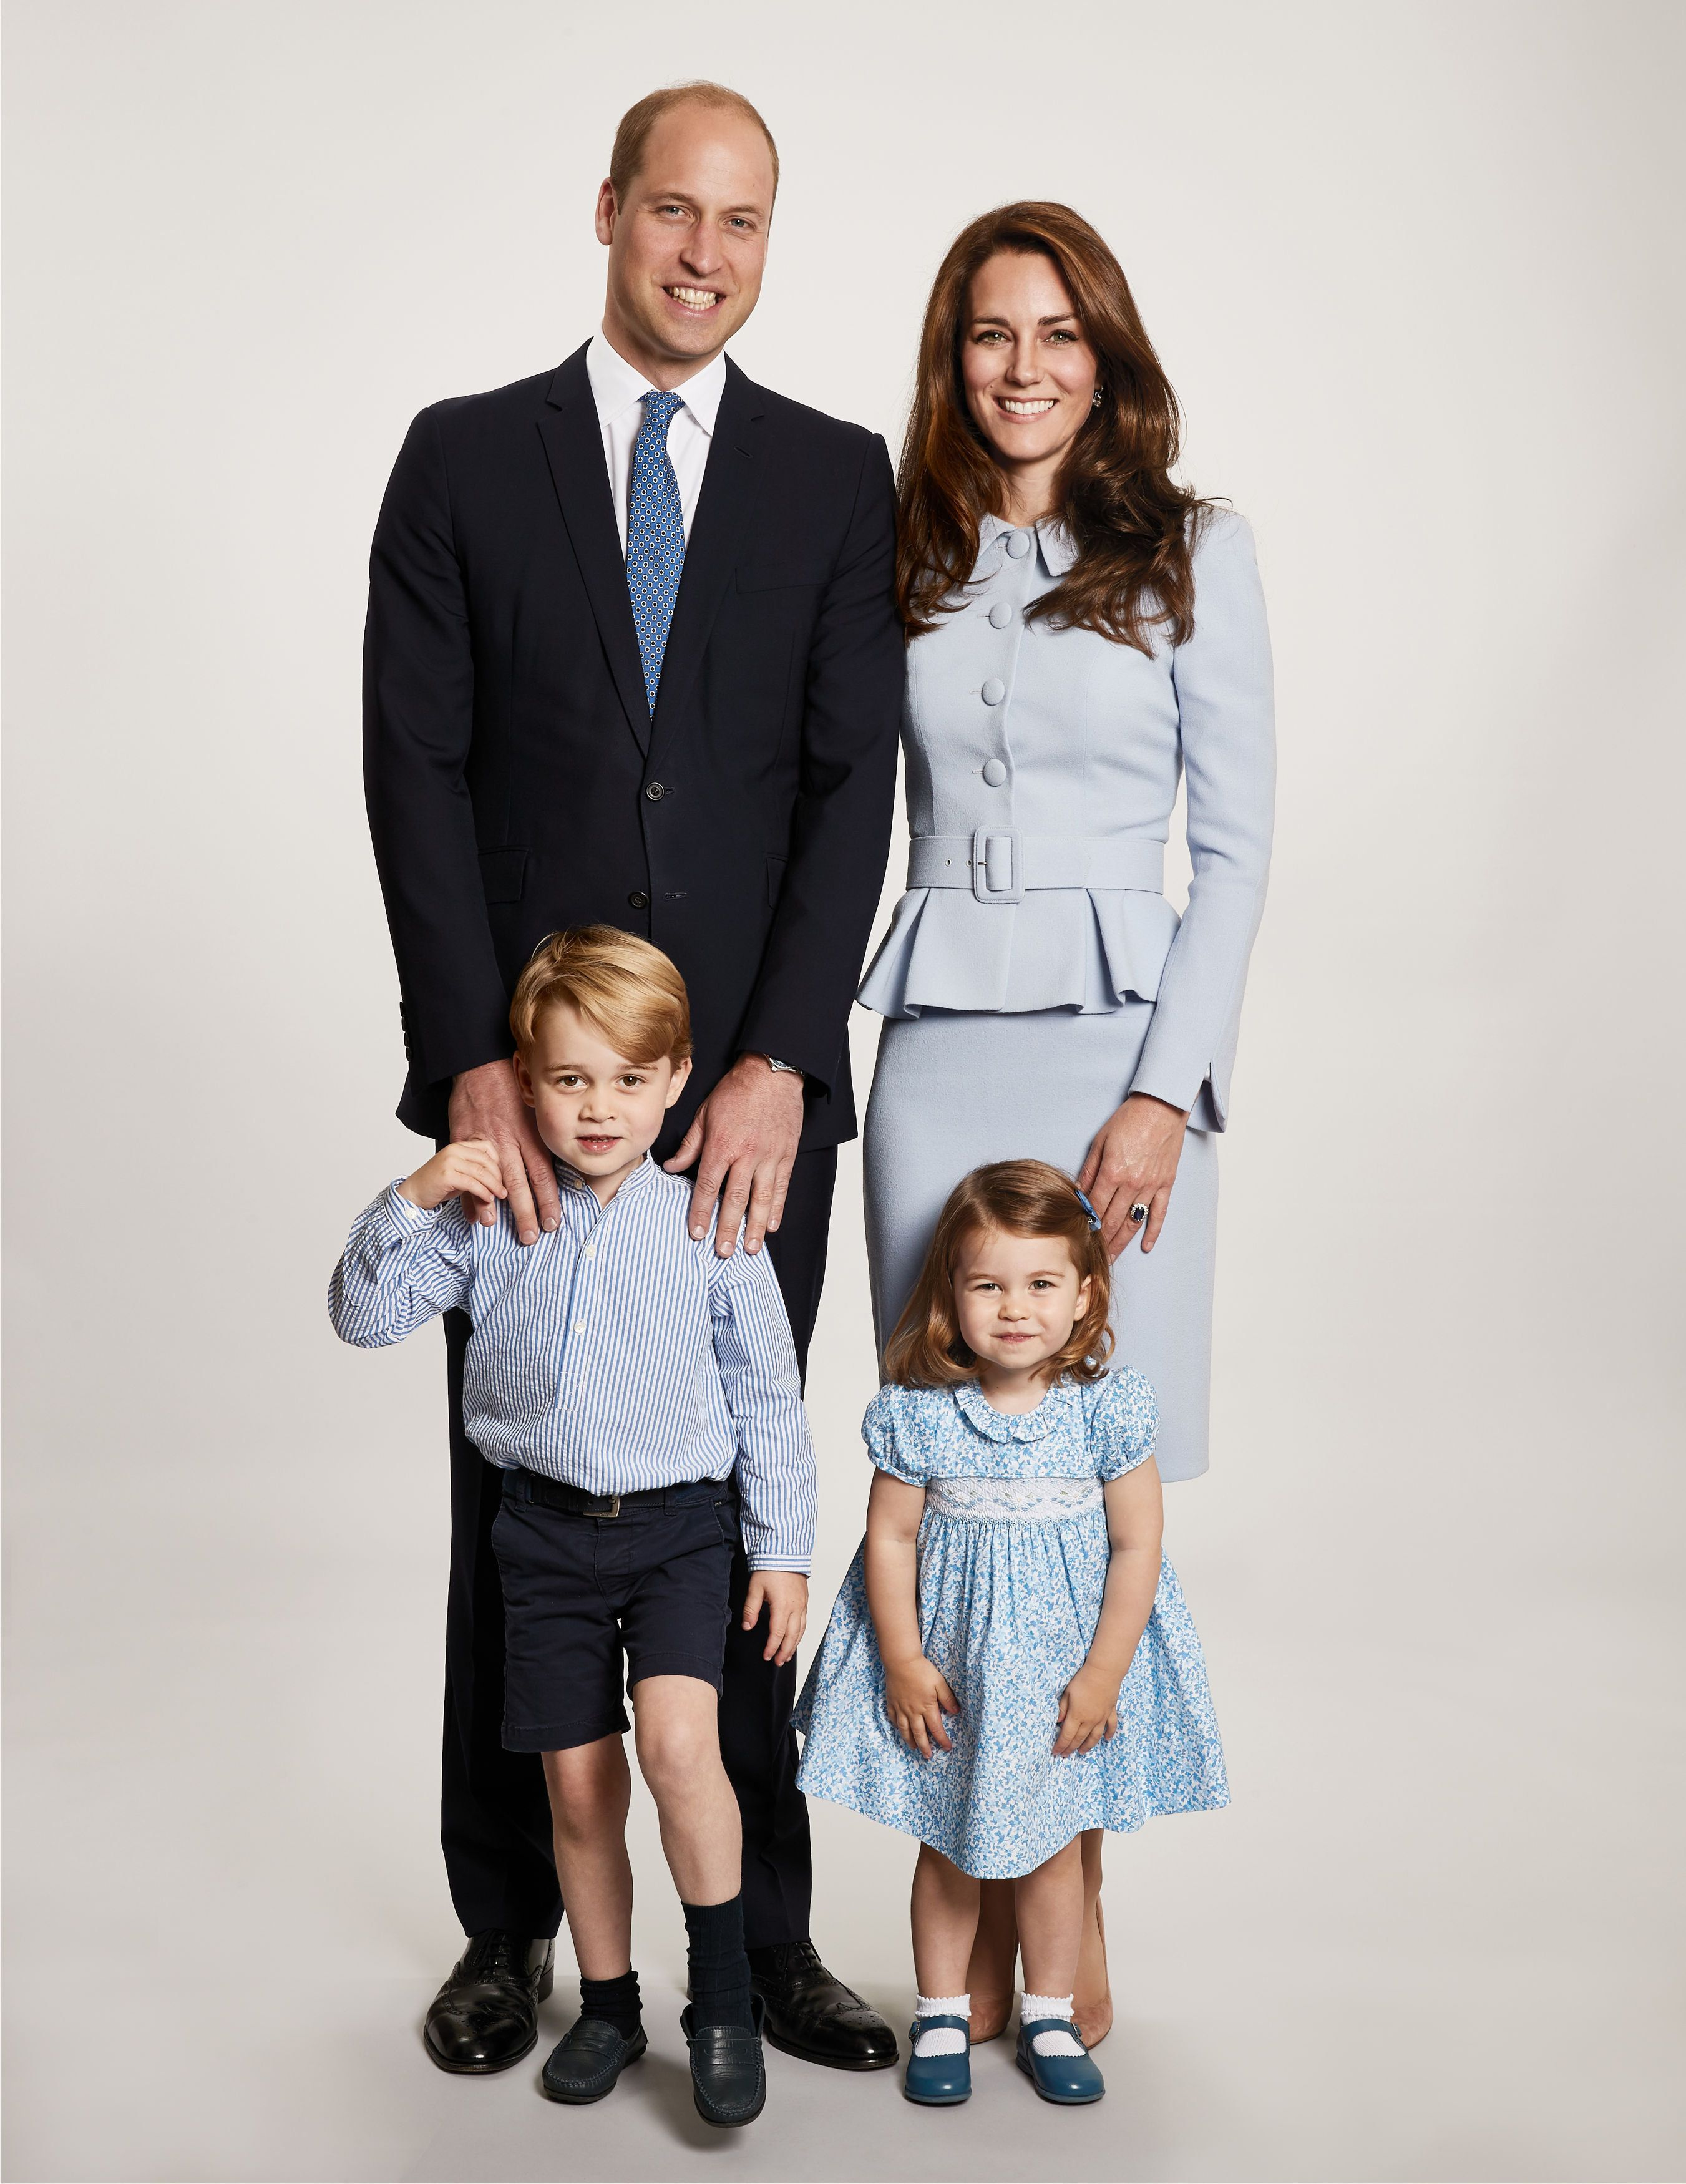 The royal family Christmas card for 2017.